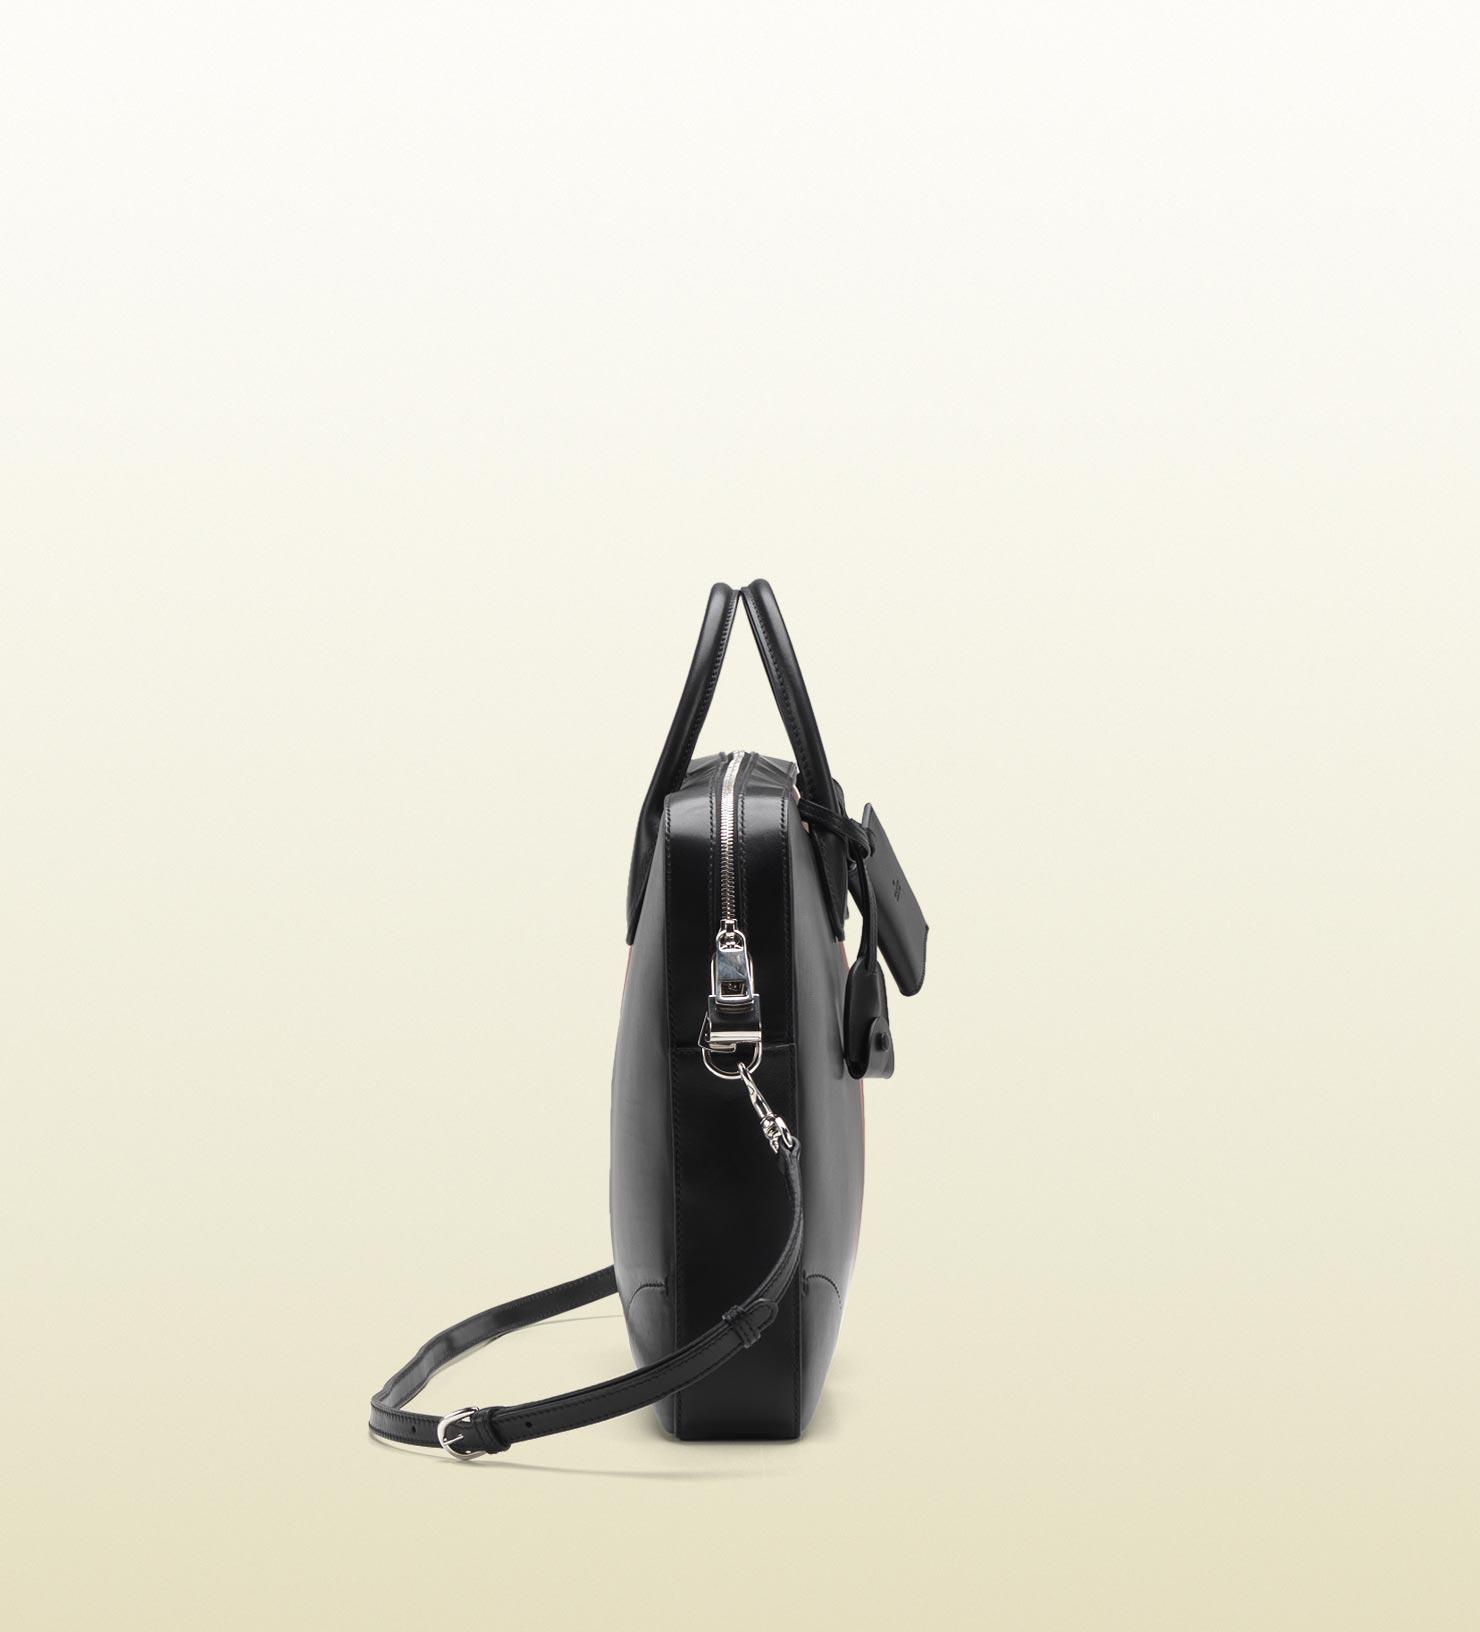 GUCCI men black leather briefcase red white 3